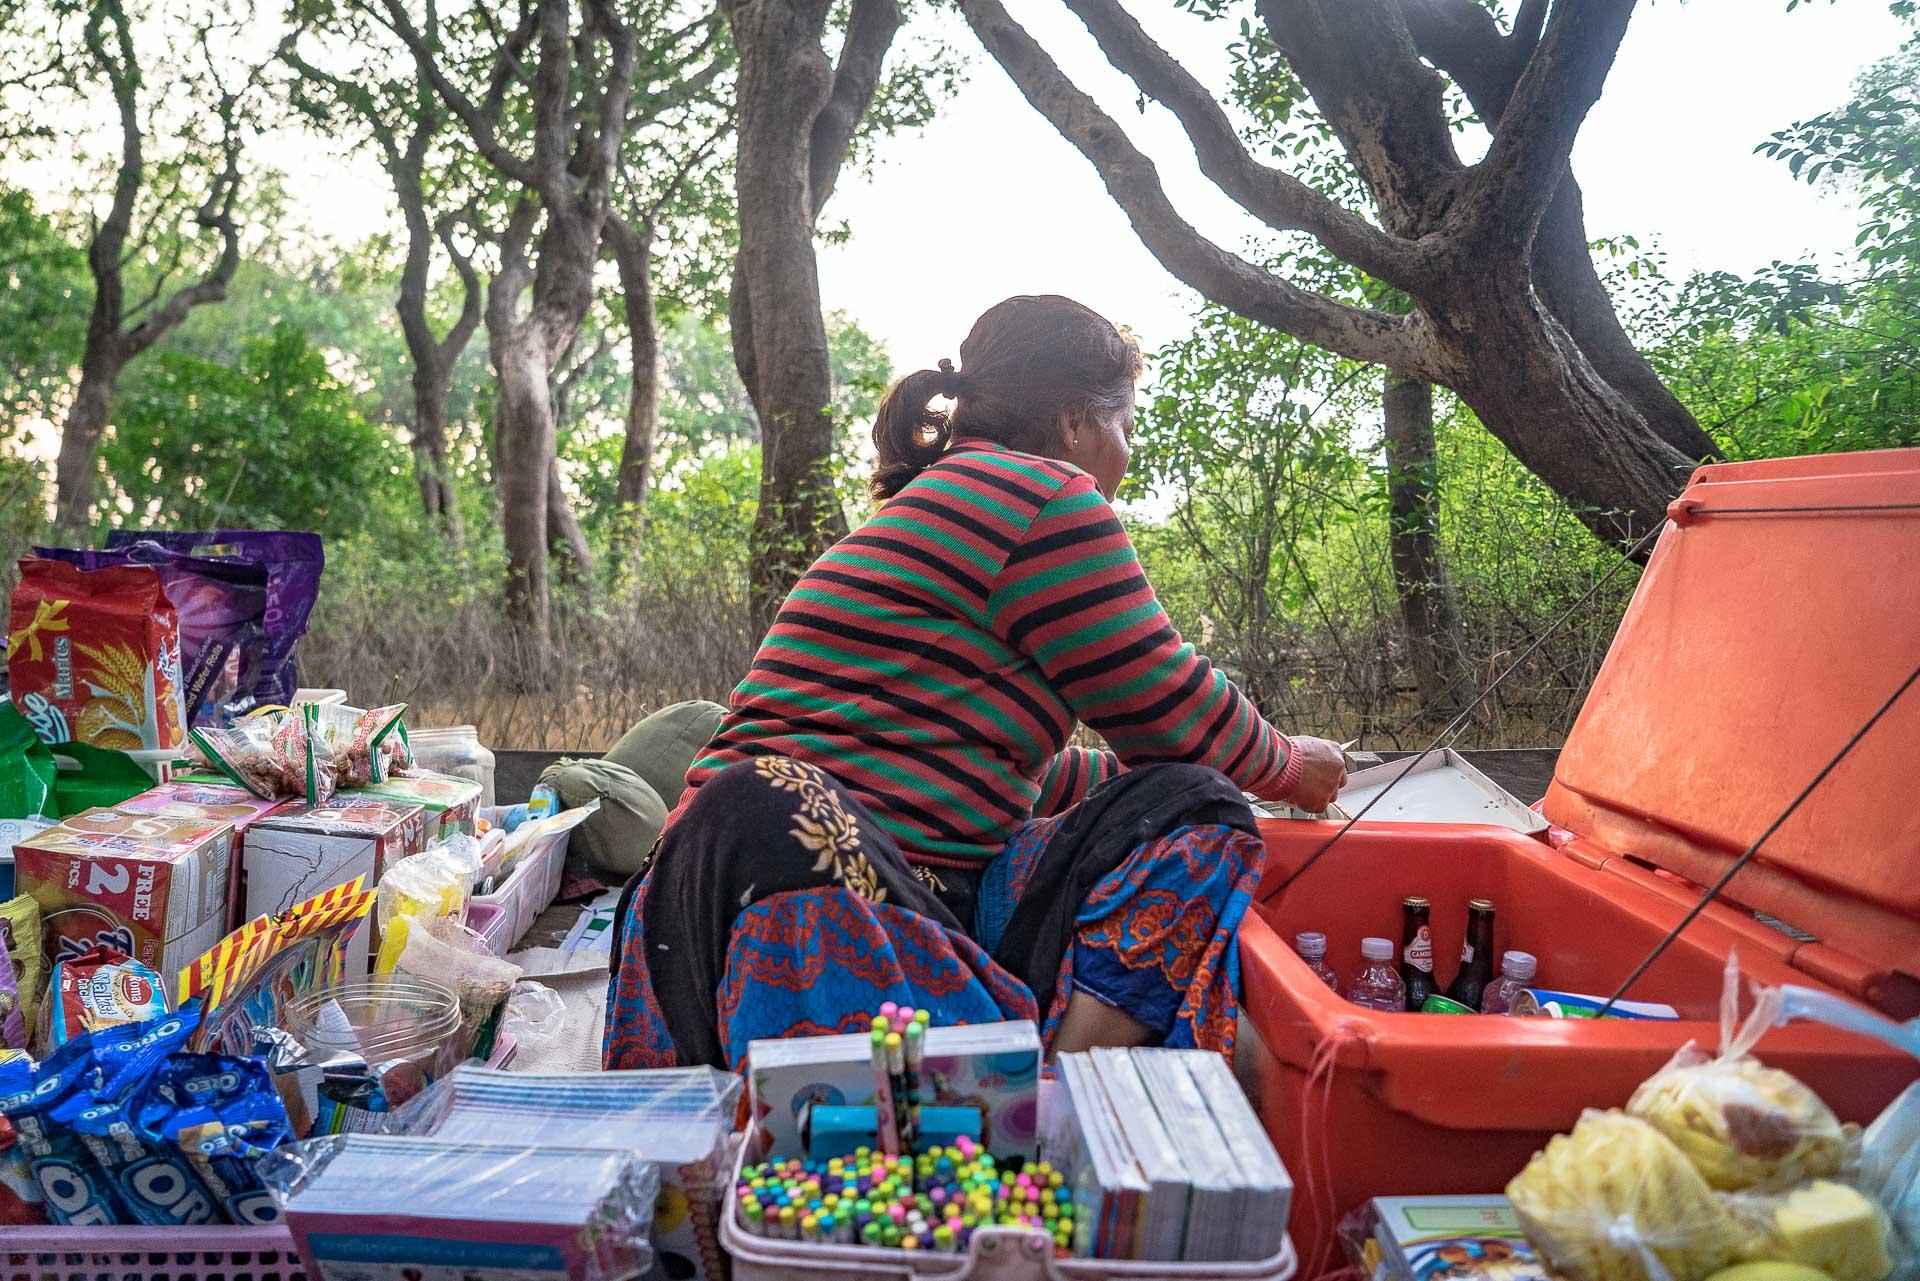 Lesvoyageuses-guide-voyage-siem-reap-angkor-cambodge-lavender-jeep-17